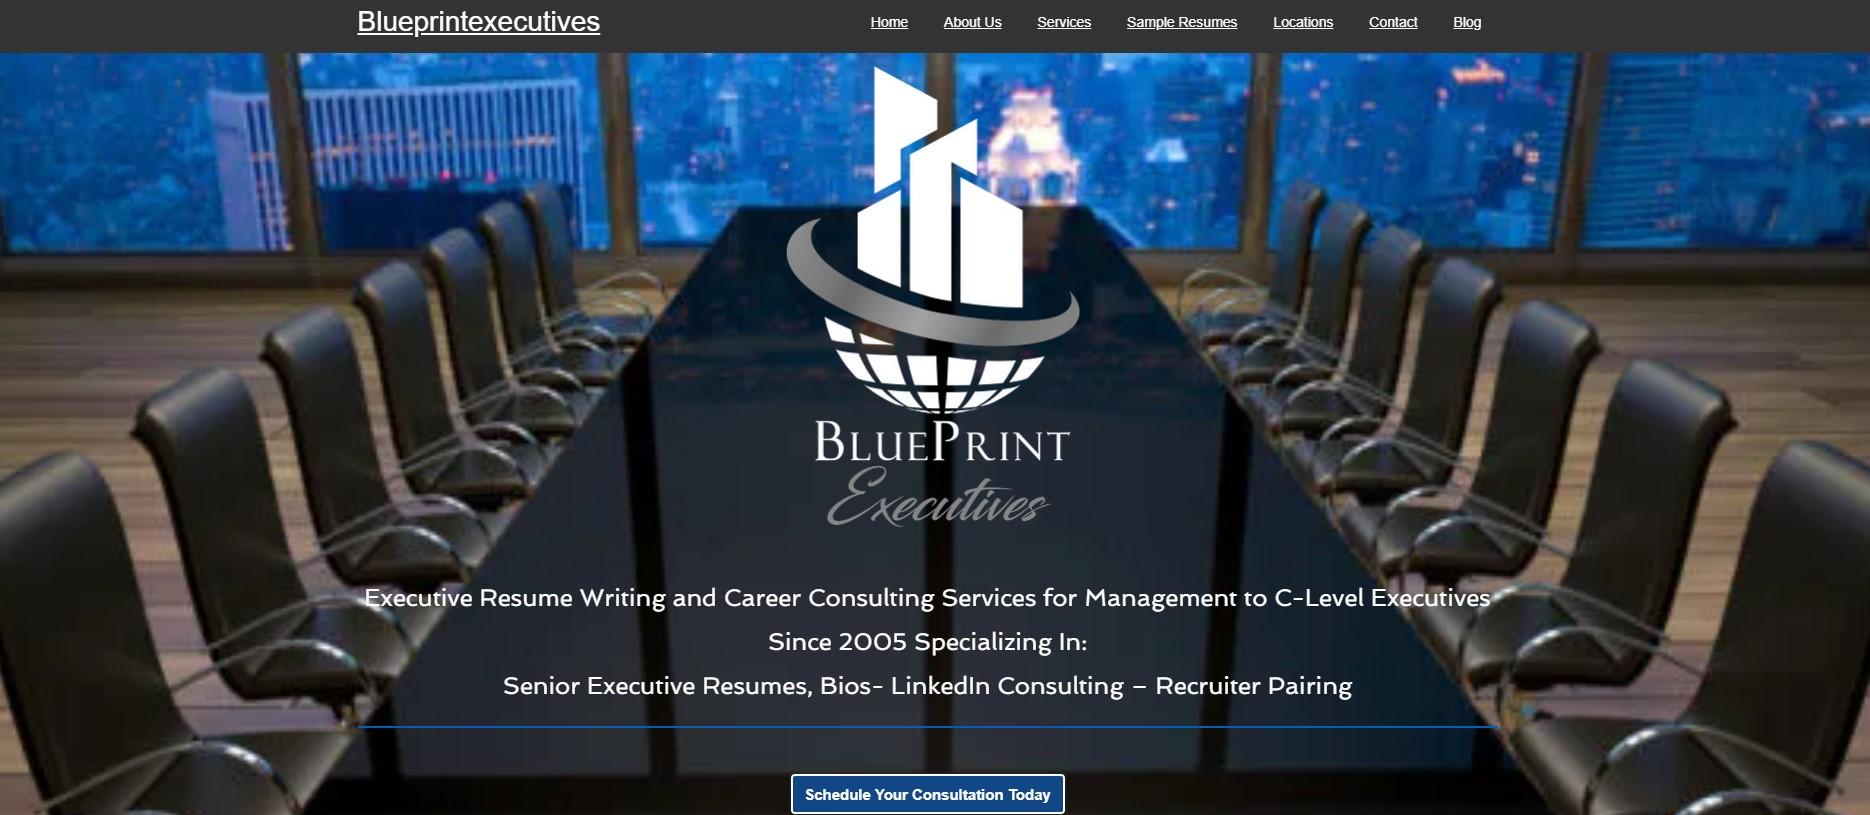 10 Best Resume Writers - screenshot of BluePrint Executives' homepage